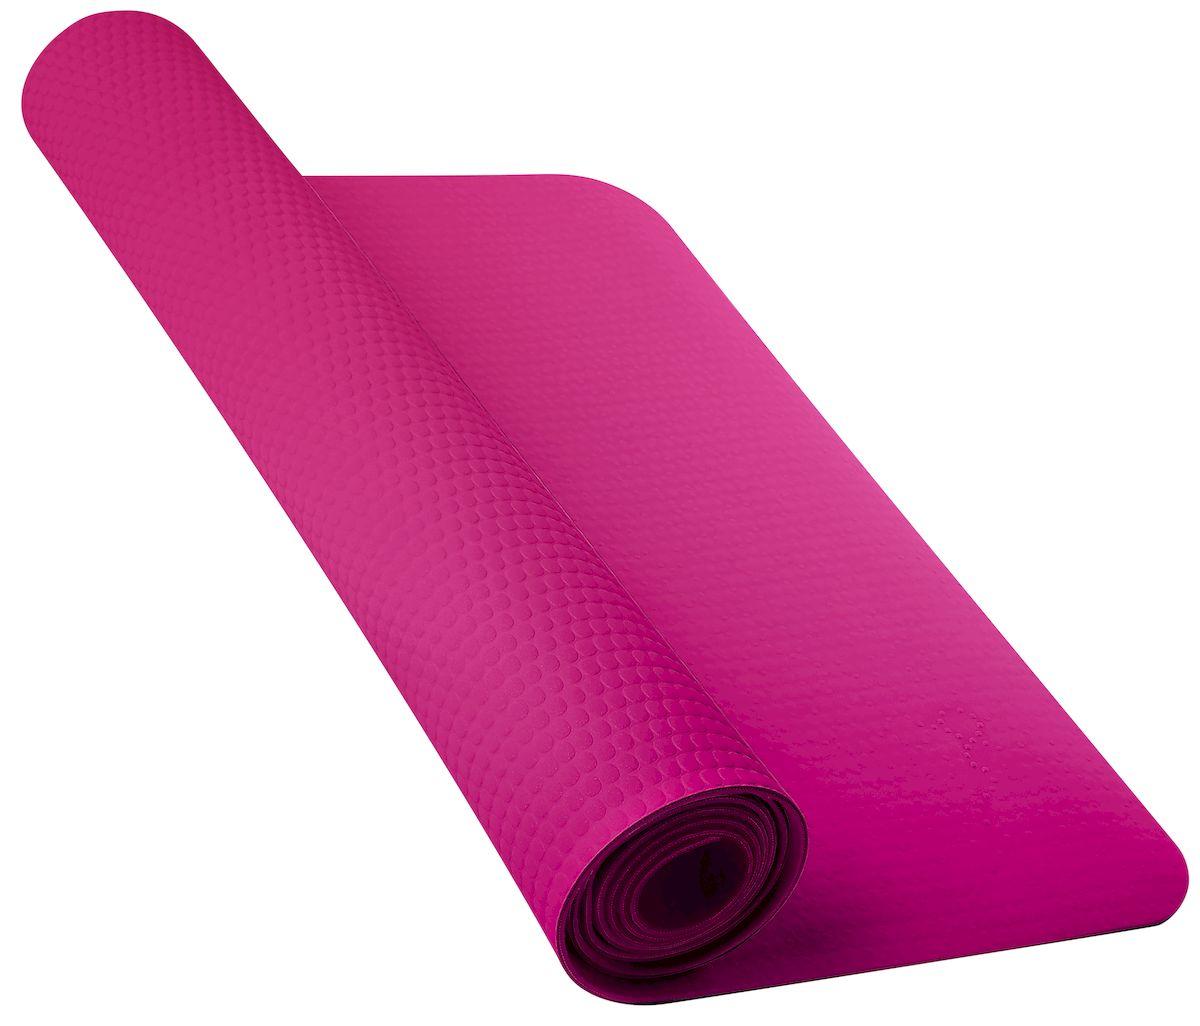 Мат для йоги Nike, цвет: розовый